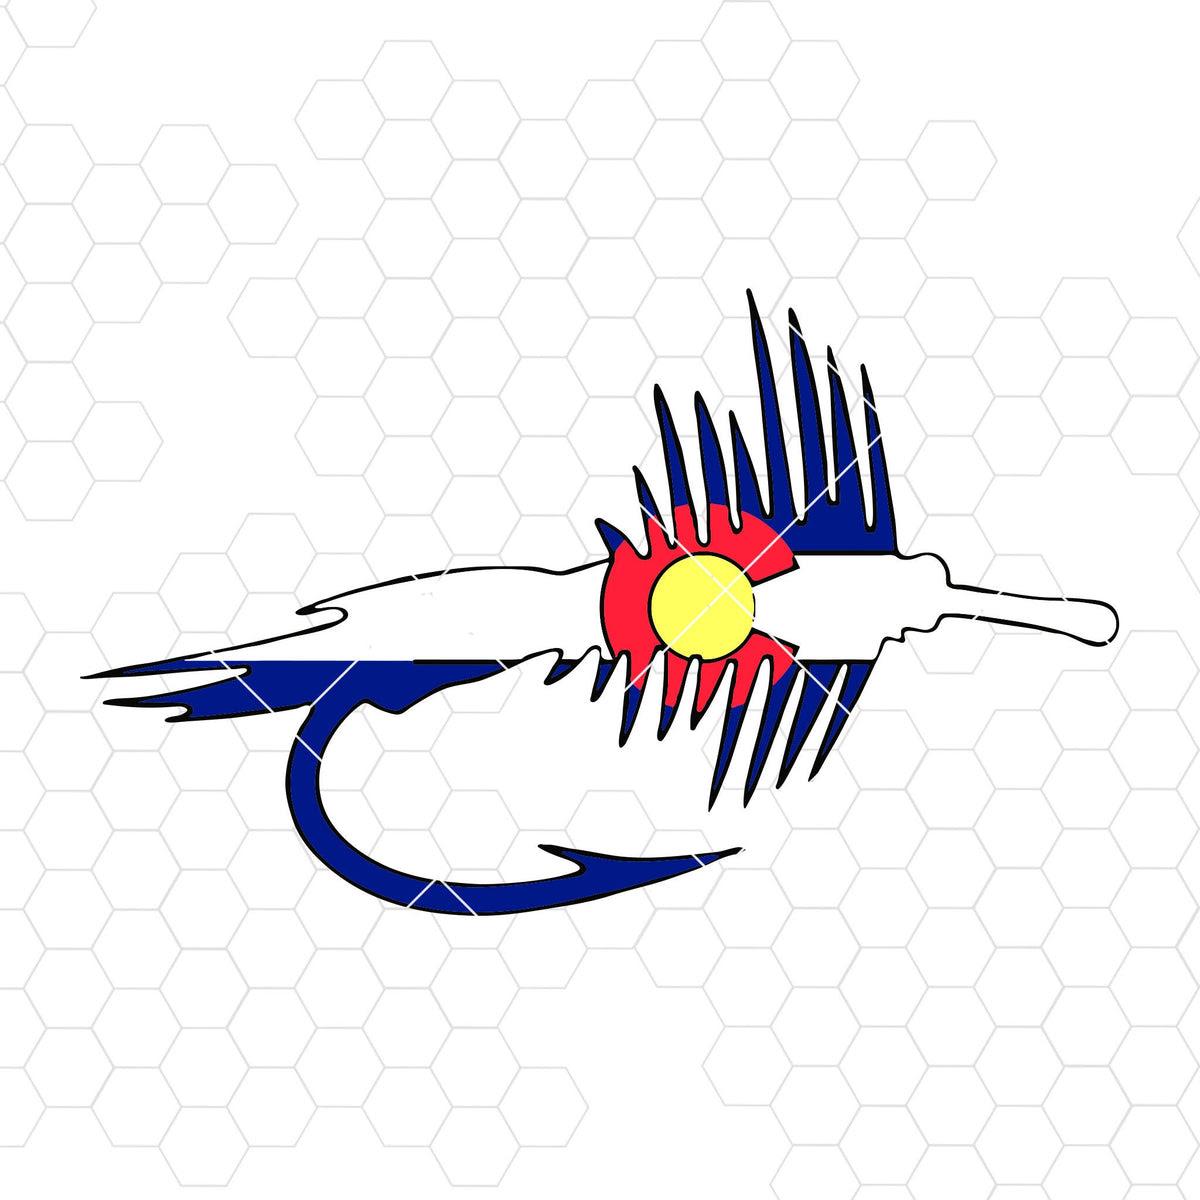 Download Colorado Flag Fly Fishing Lure Digital Cut Files Svg Dxf Eps Png C Doranstars